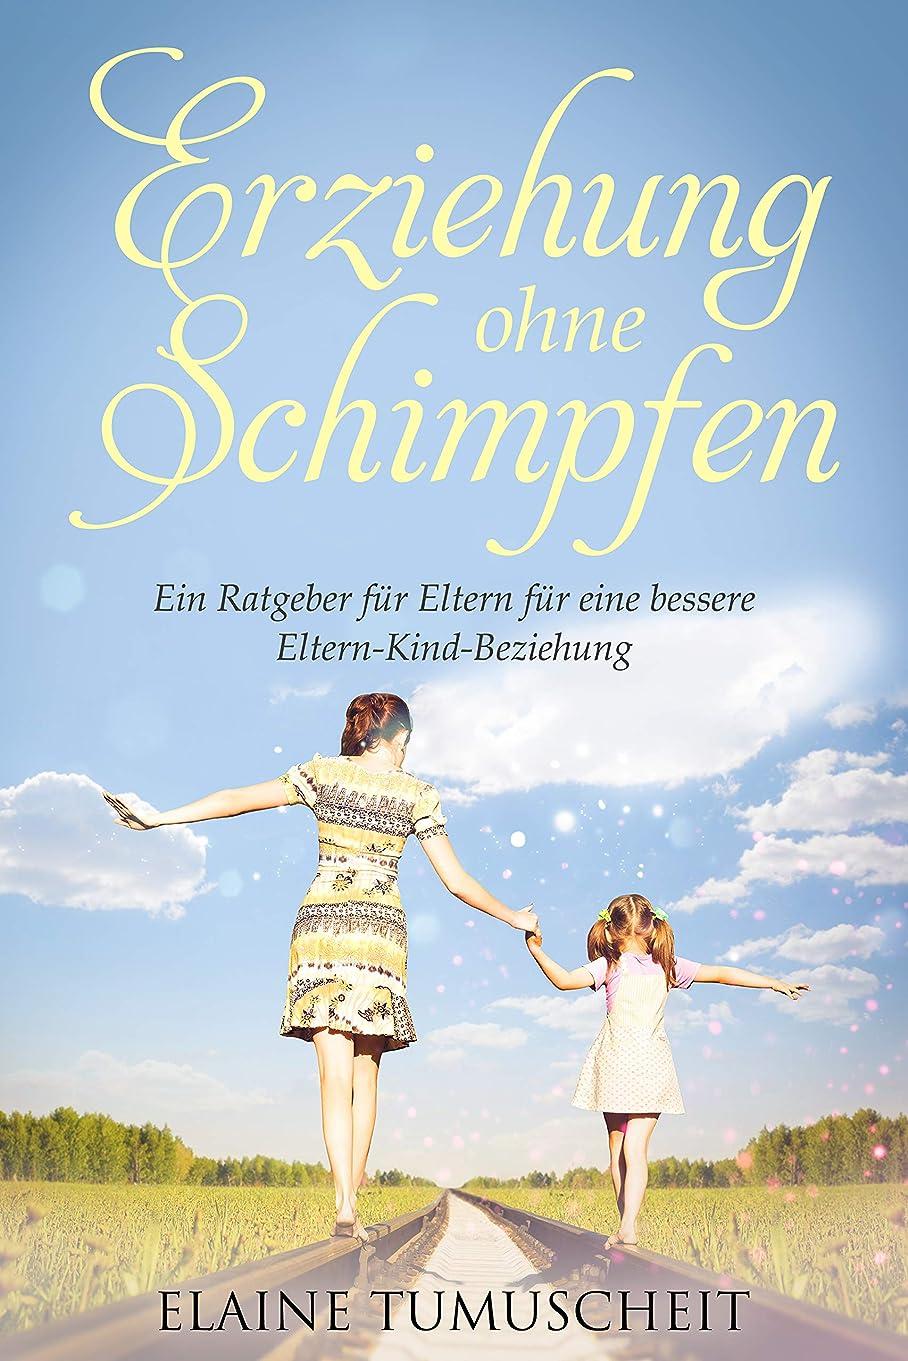 計算可能証書使用法Erziehung ohne Schimpfen: Ein Ratgeber für Eltern für eine bessere Eltern-Kind-Beziehung (German Edition)